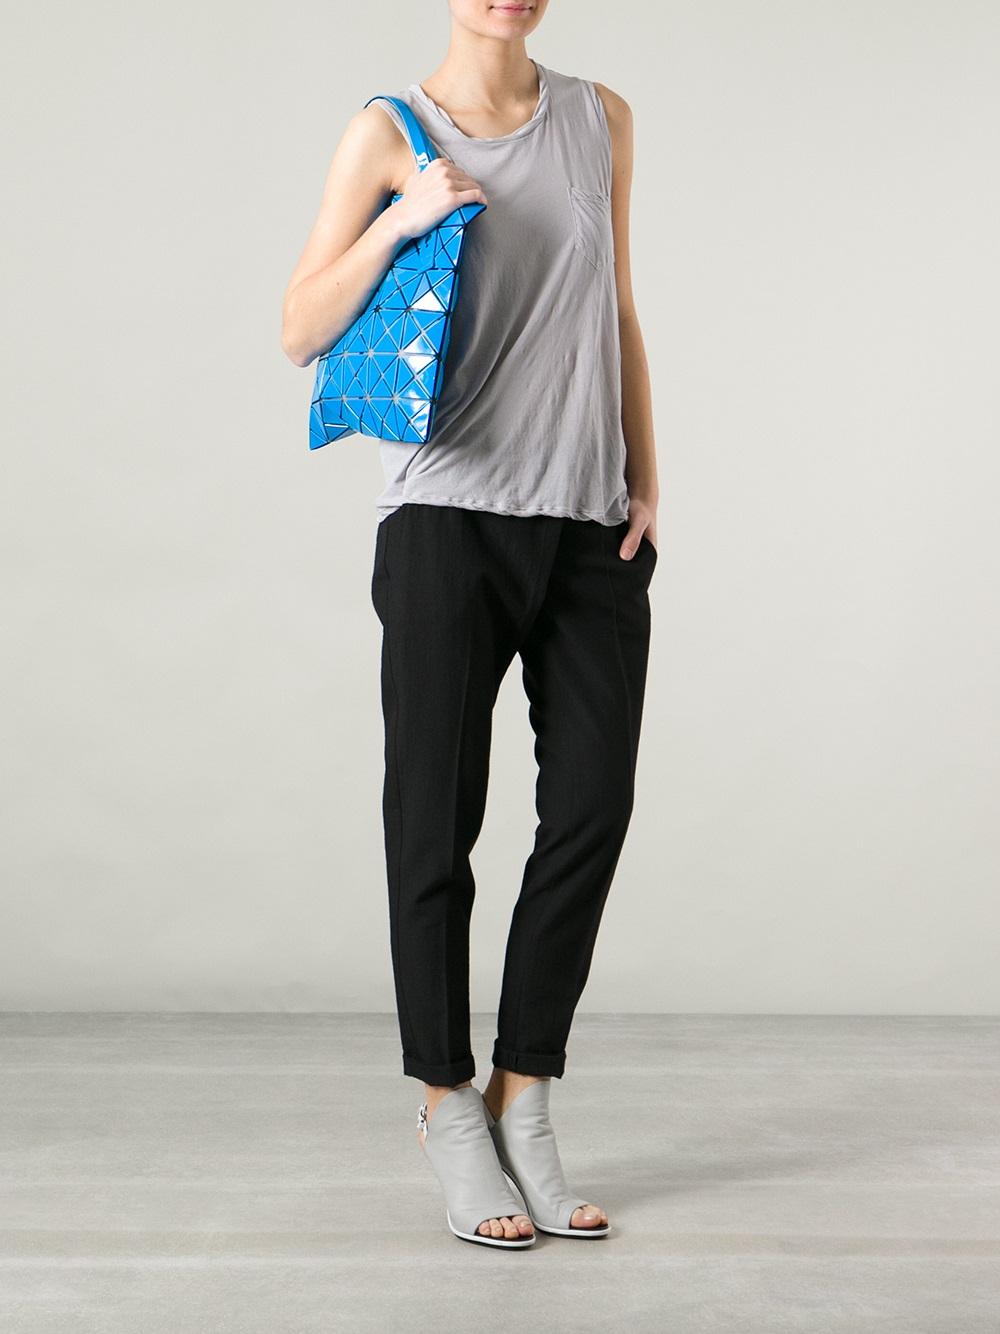 2798278ec2 Lyst - Bao Bao Issey Miyake Tote Bag in Blue